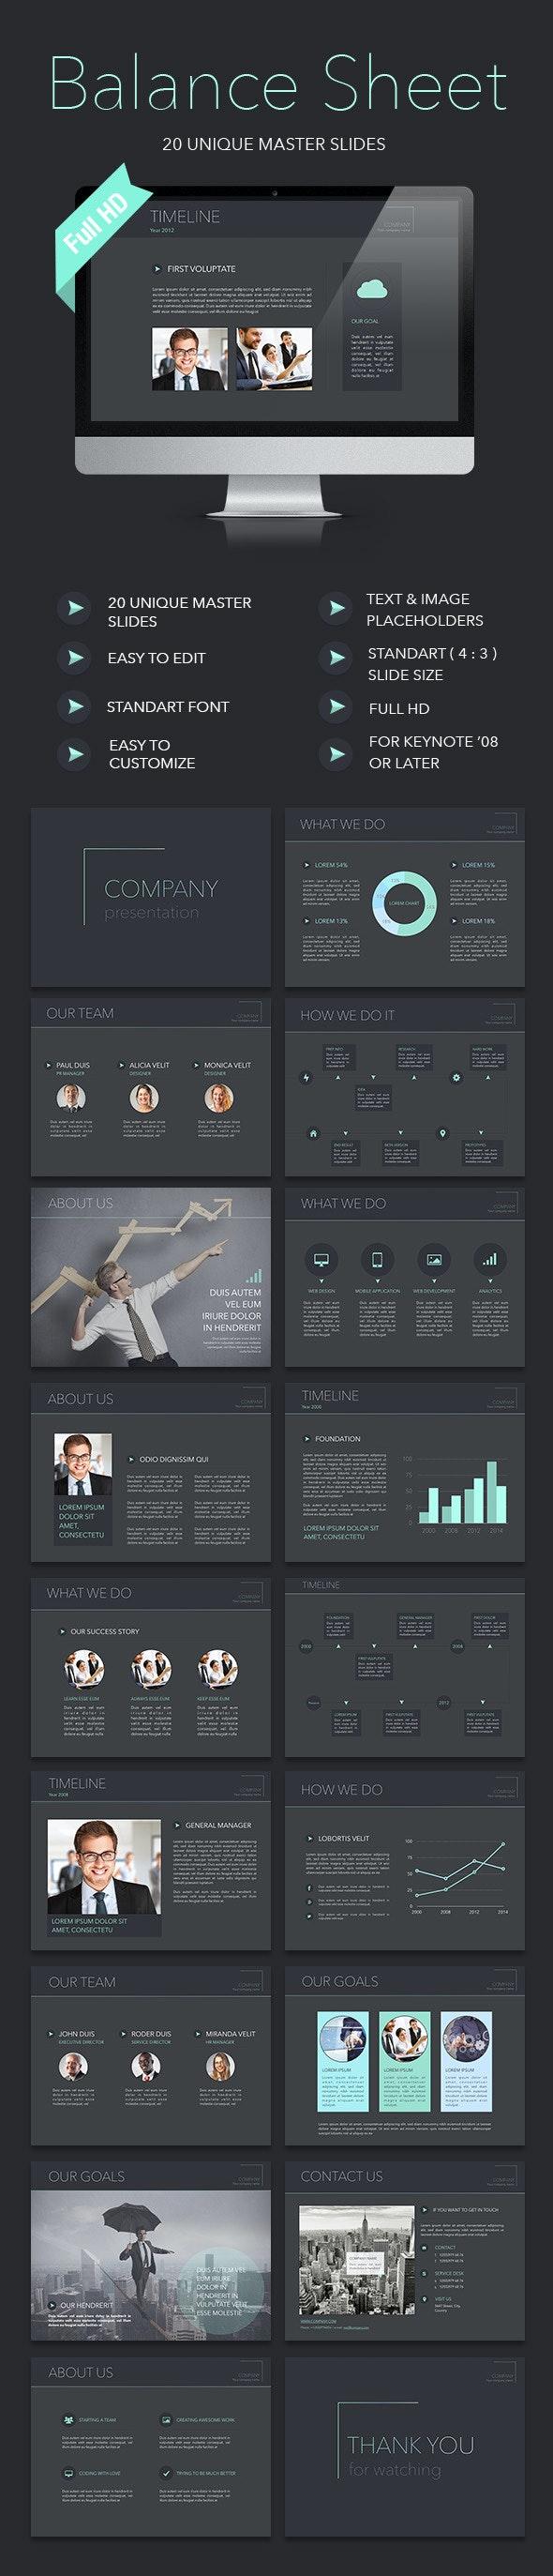 Balance Sheet Keynote Template - Keynote Templates Presentation Templates